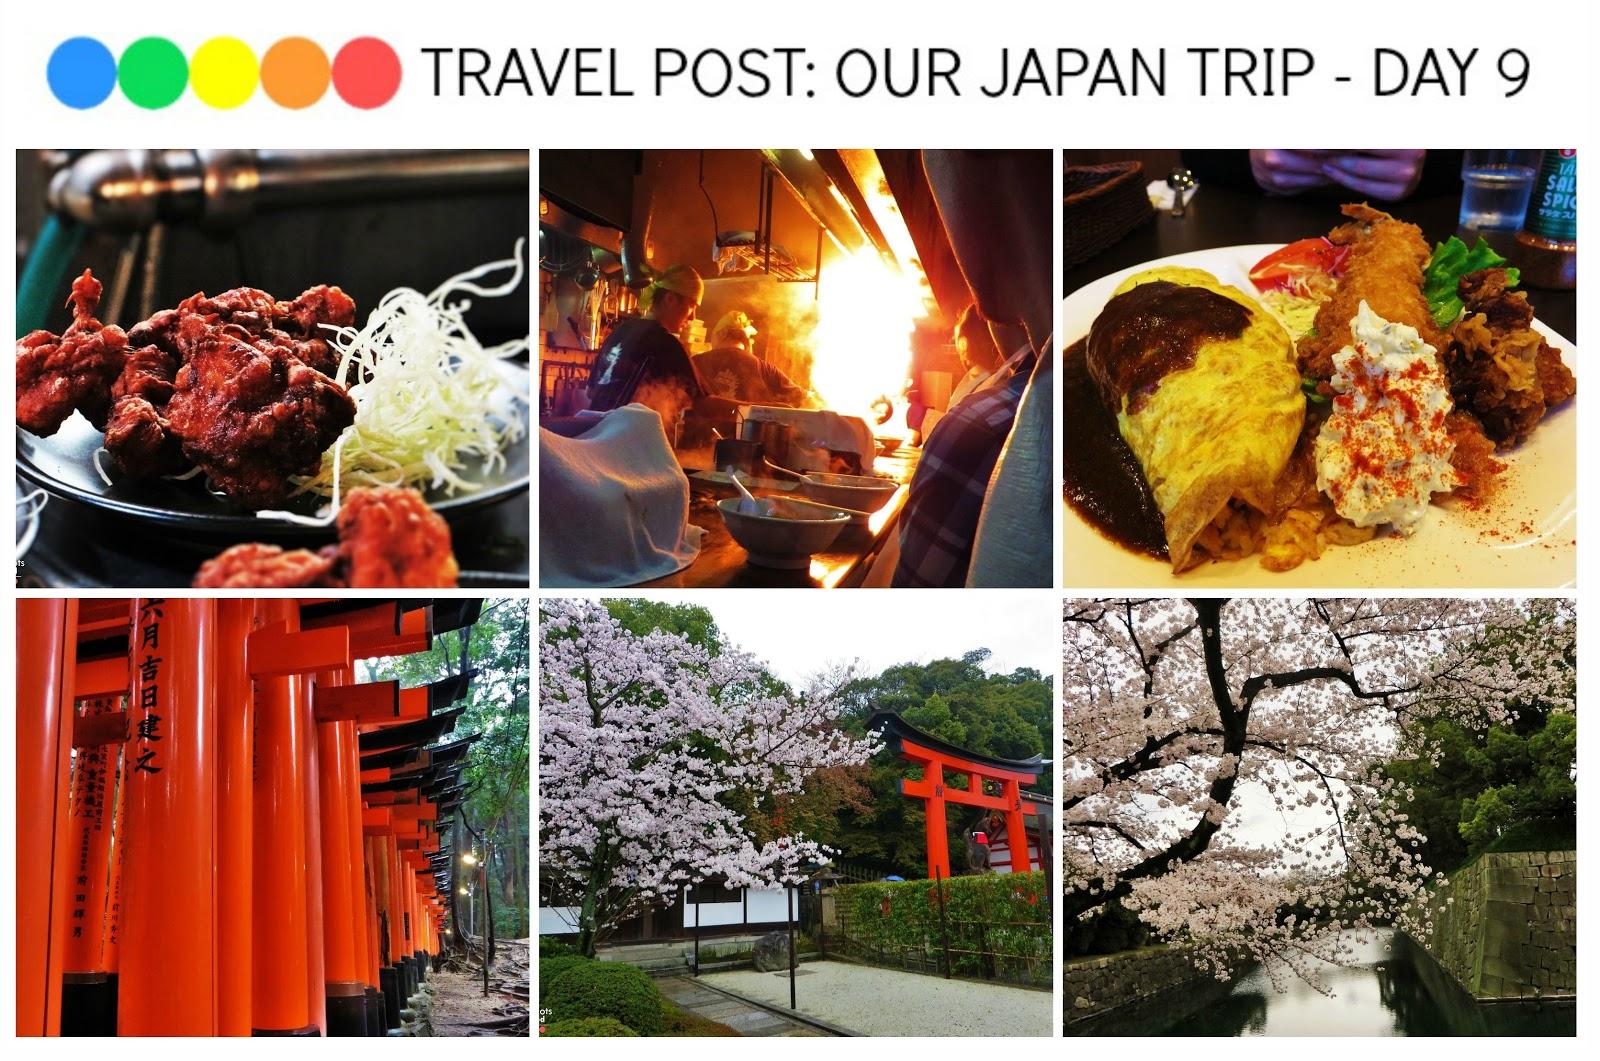 Exploring Kyoto - Fushimi Inari Taisha, Nijo Castle, Menbakaichidai Ramen Restaurant